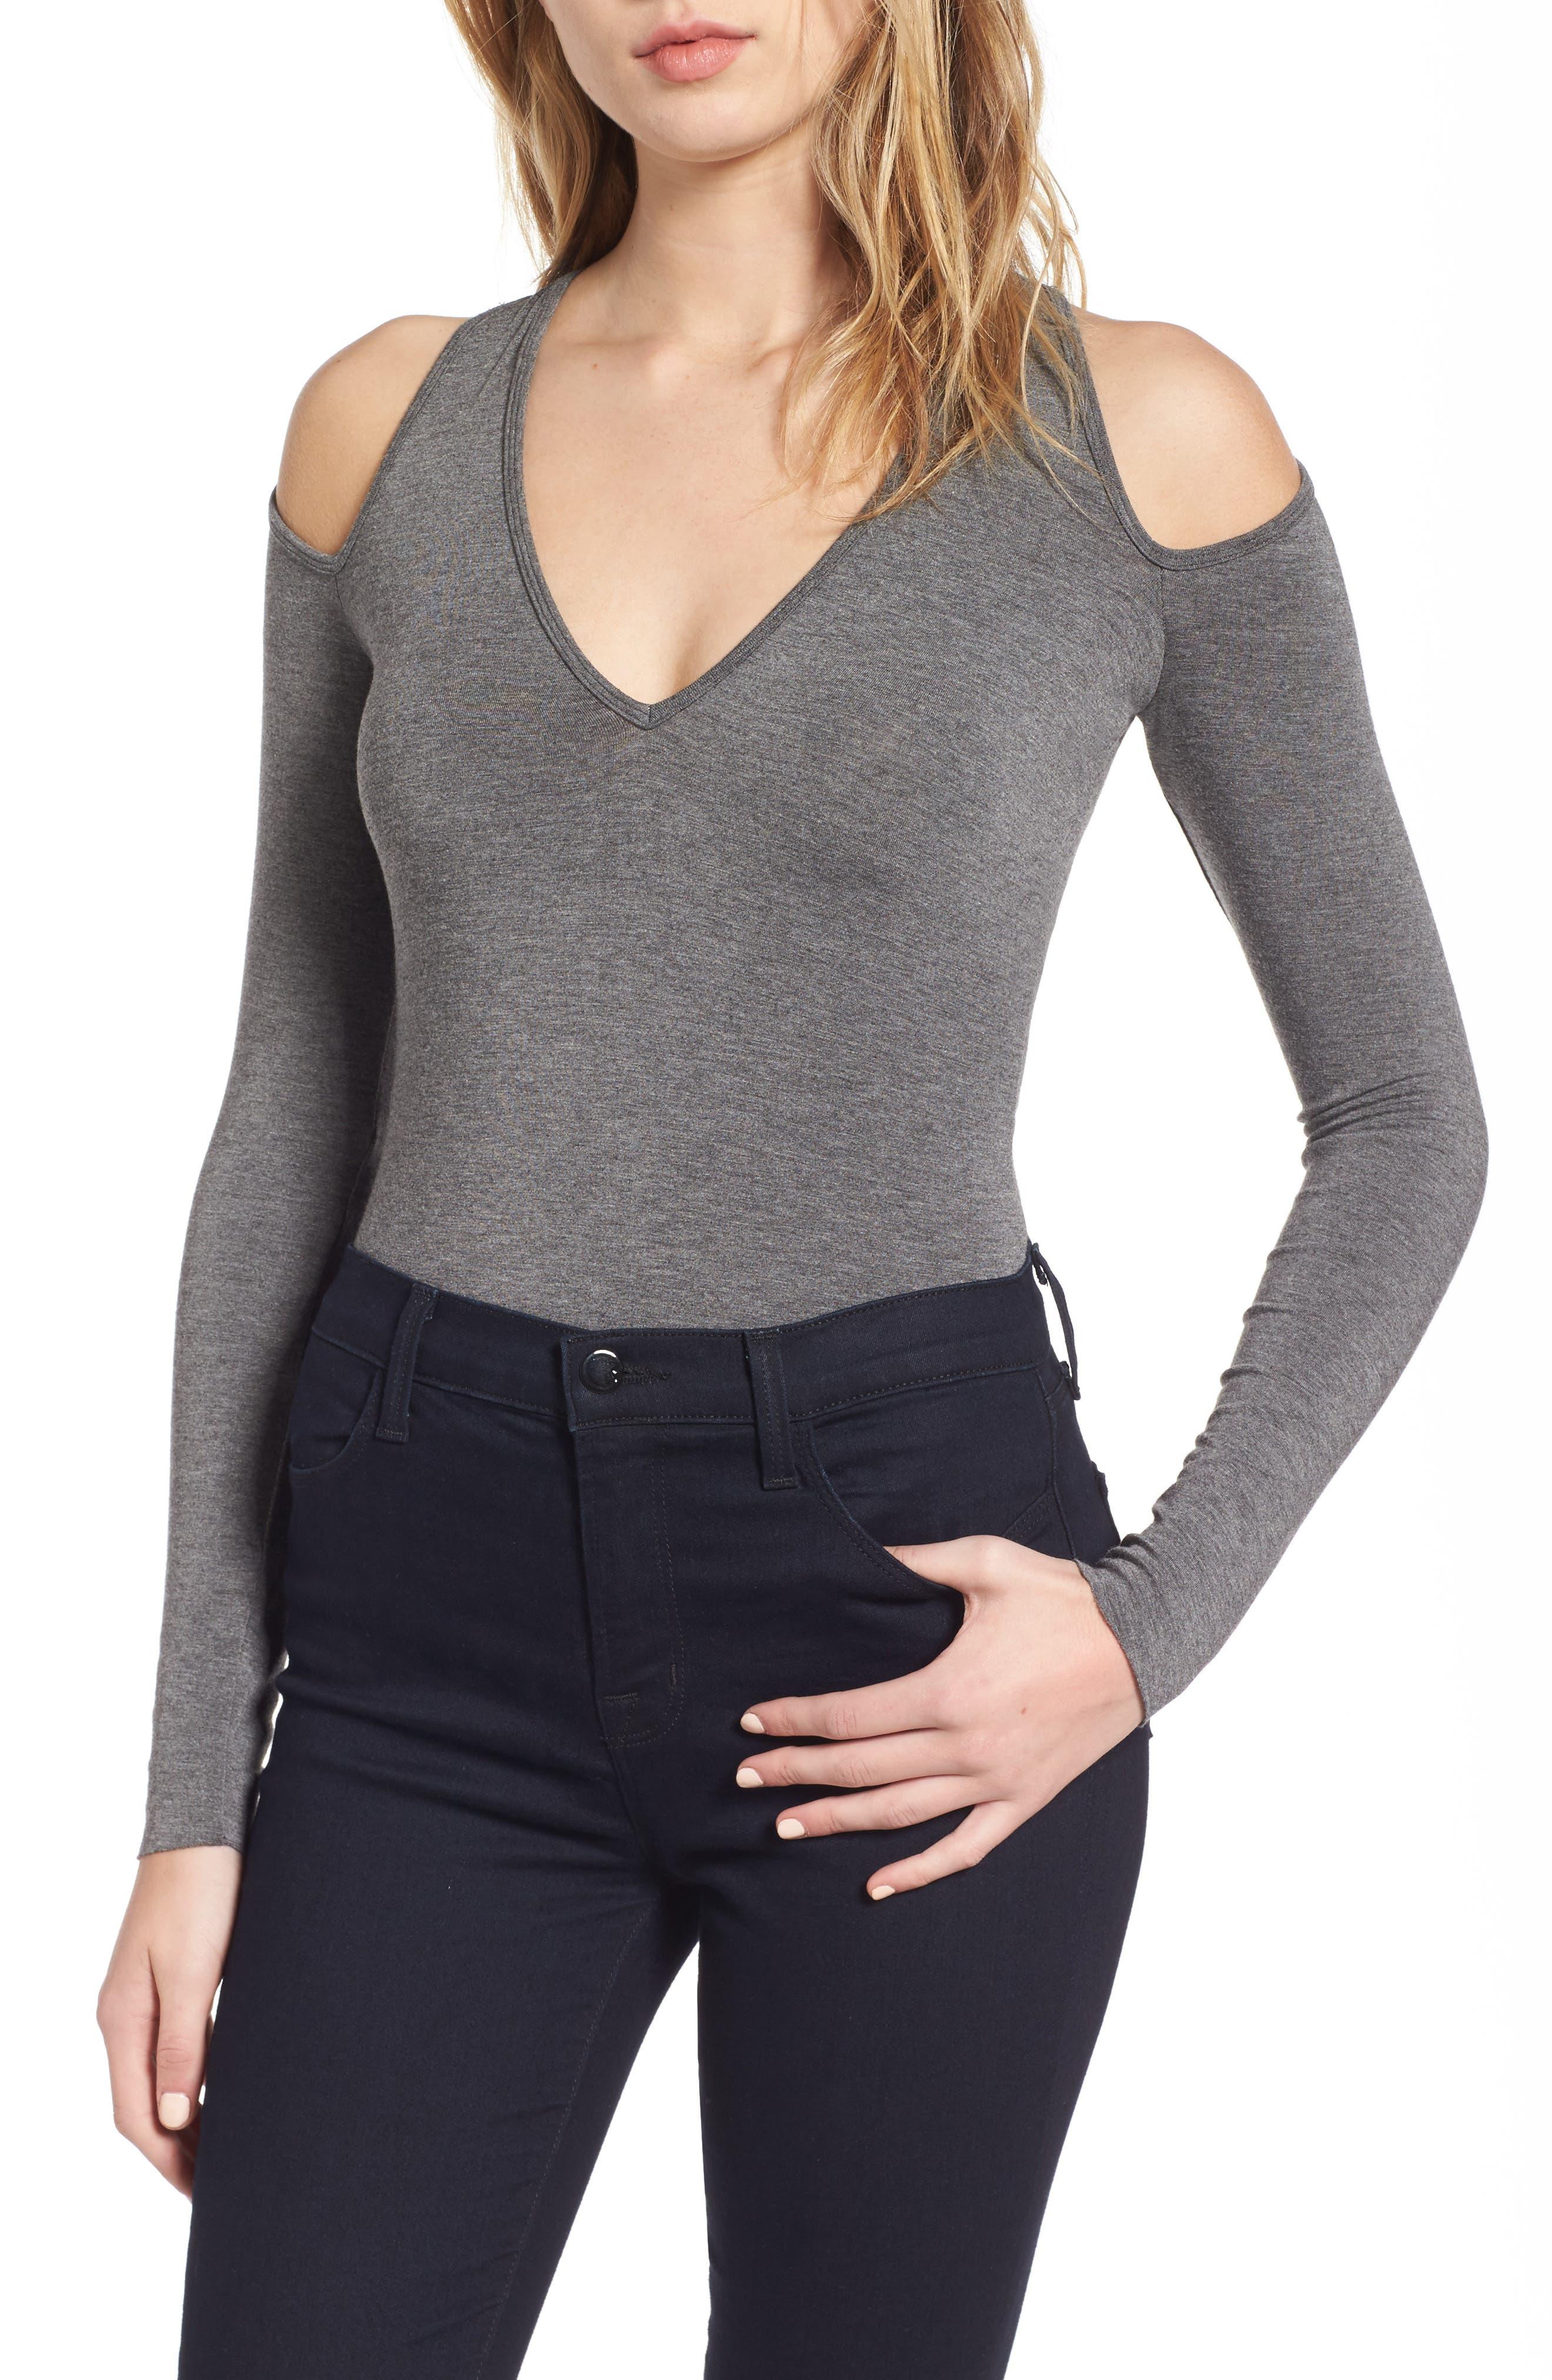 Main Image - Bailey 44 Patricia Cold Shoulder Bodysuit